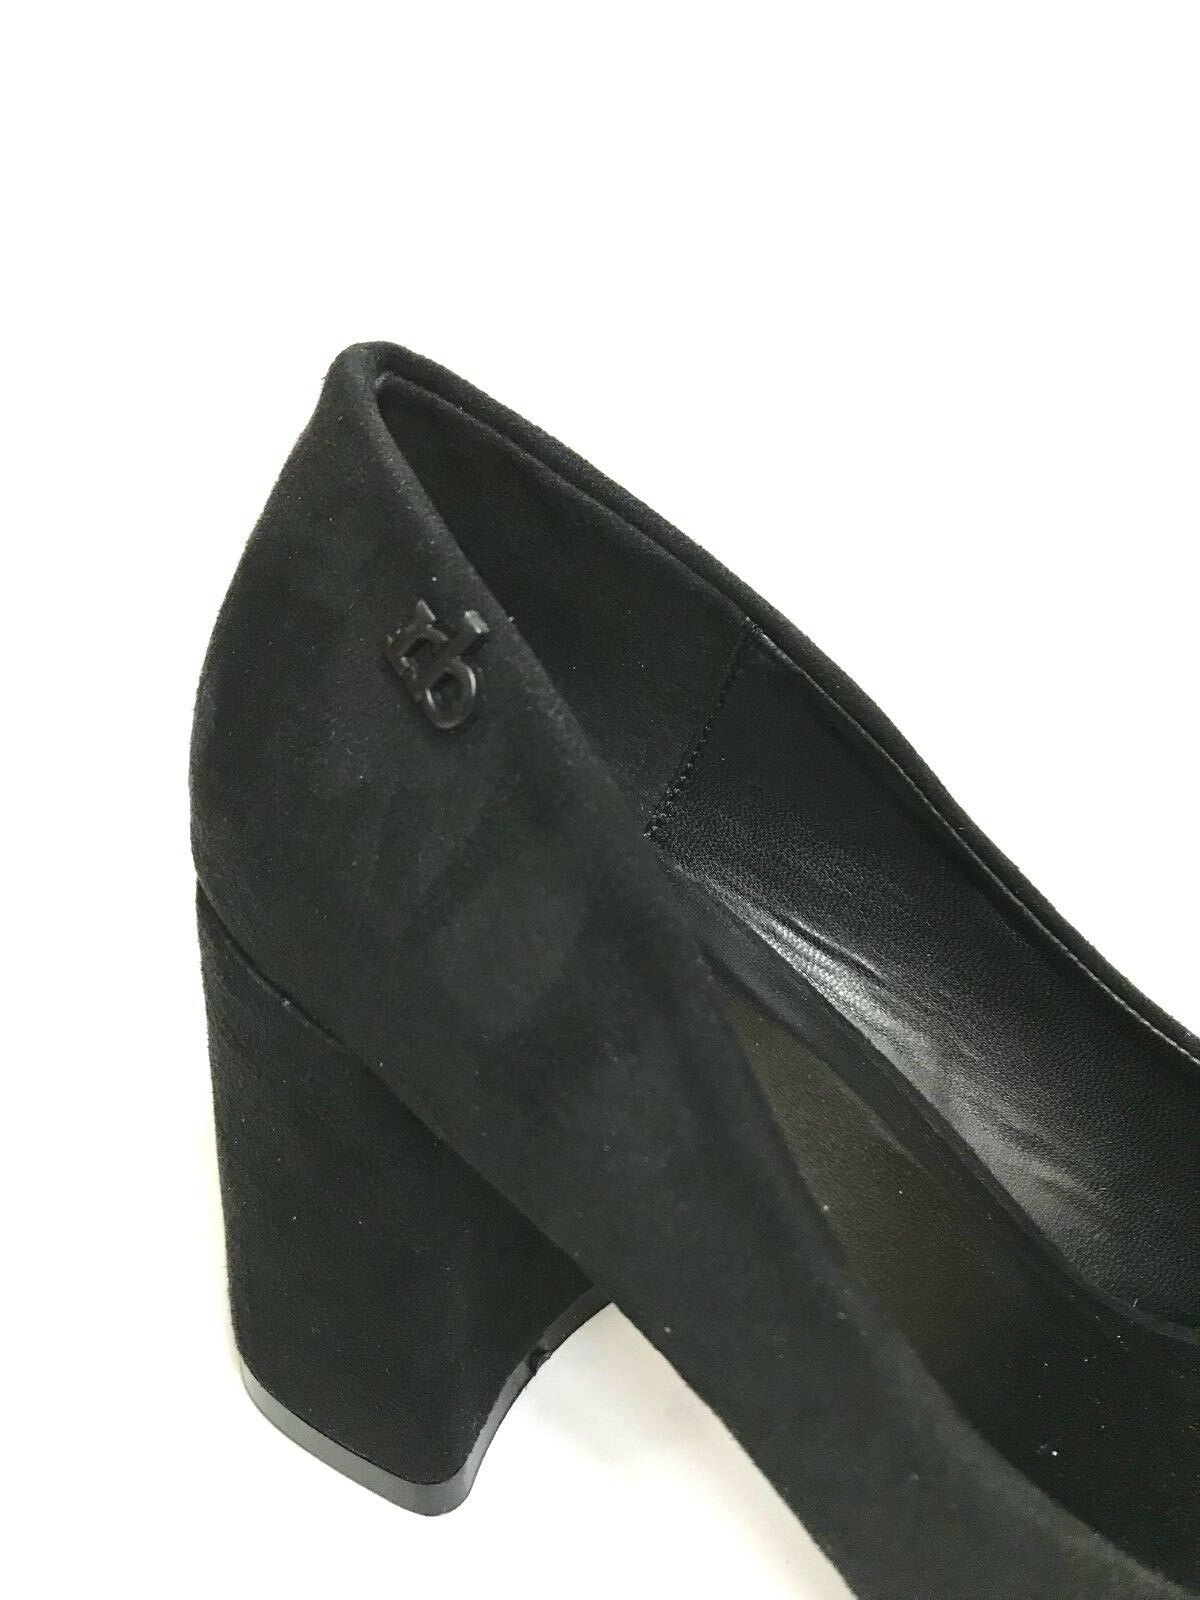 Schuhe Damens TACCO ROCCOBAROCCO DECOLTE' TACCO Damens NADYA NERO INVERNO 2018/19 SCONTO 10% 4405a9